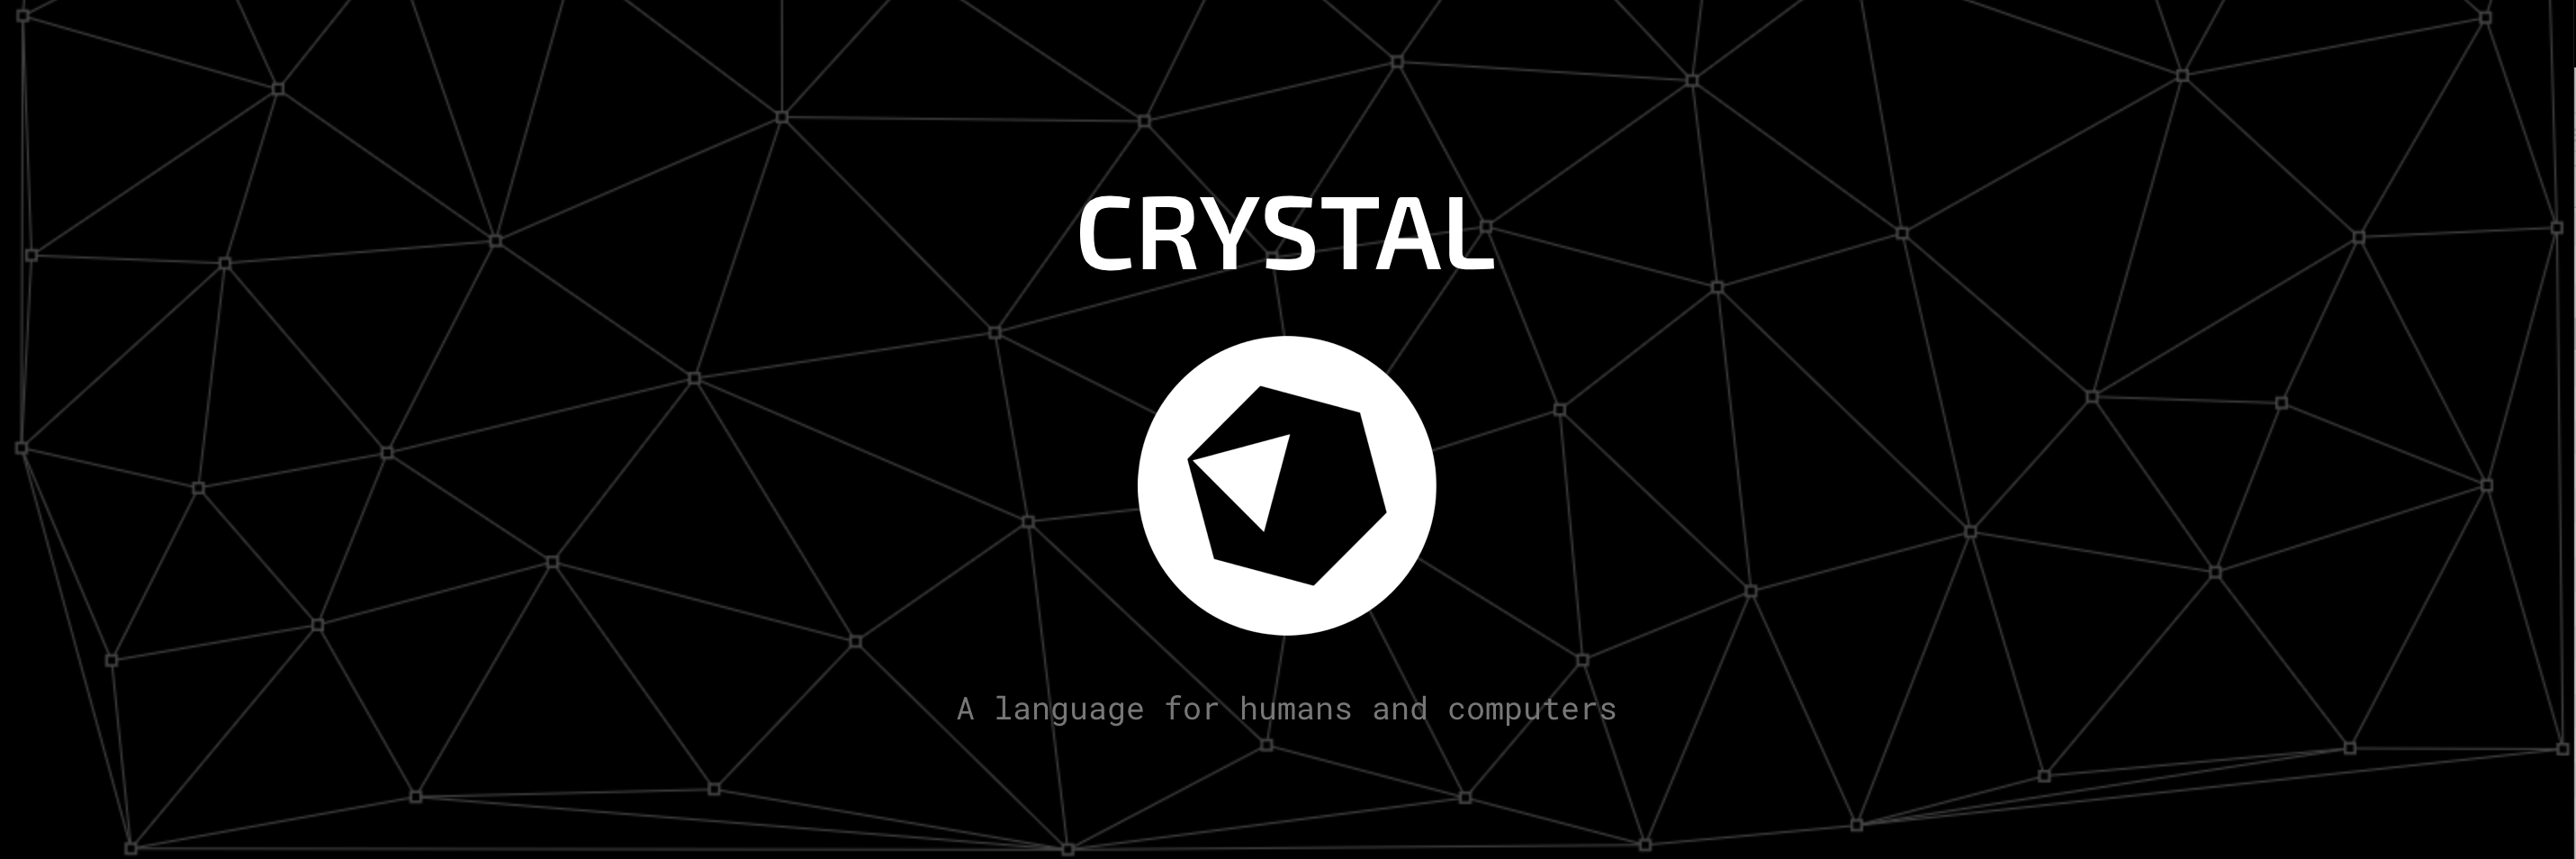 Crystal banner